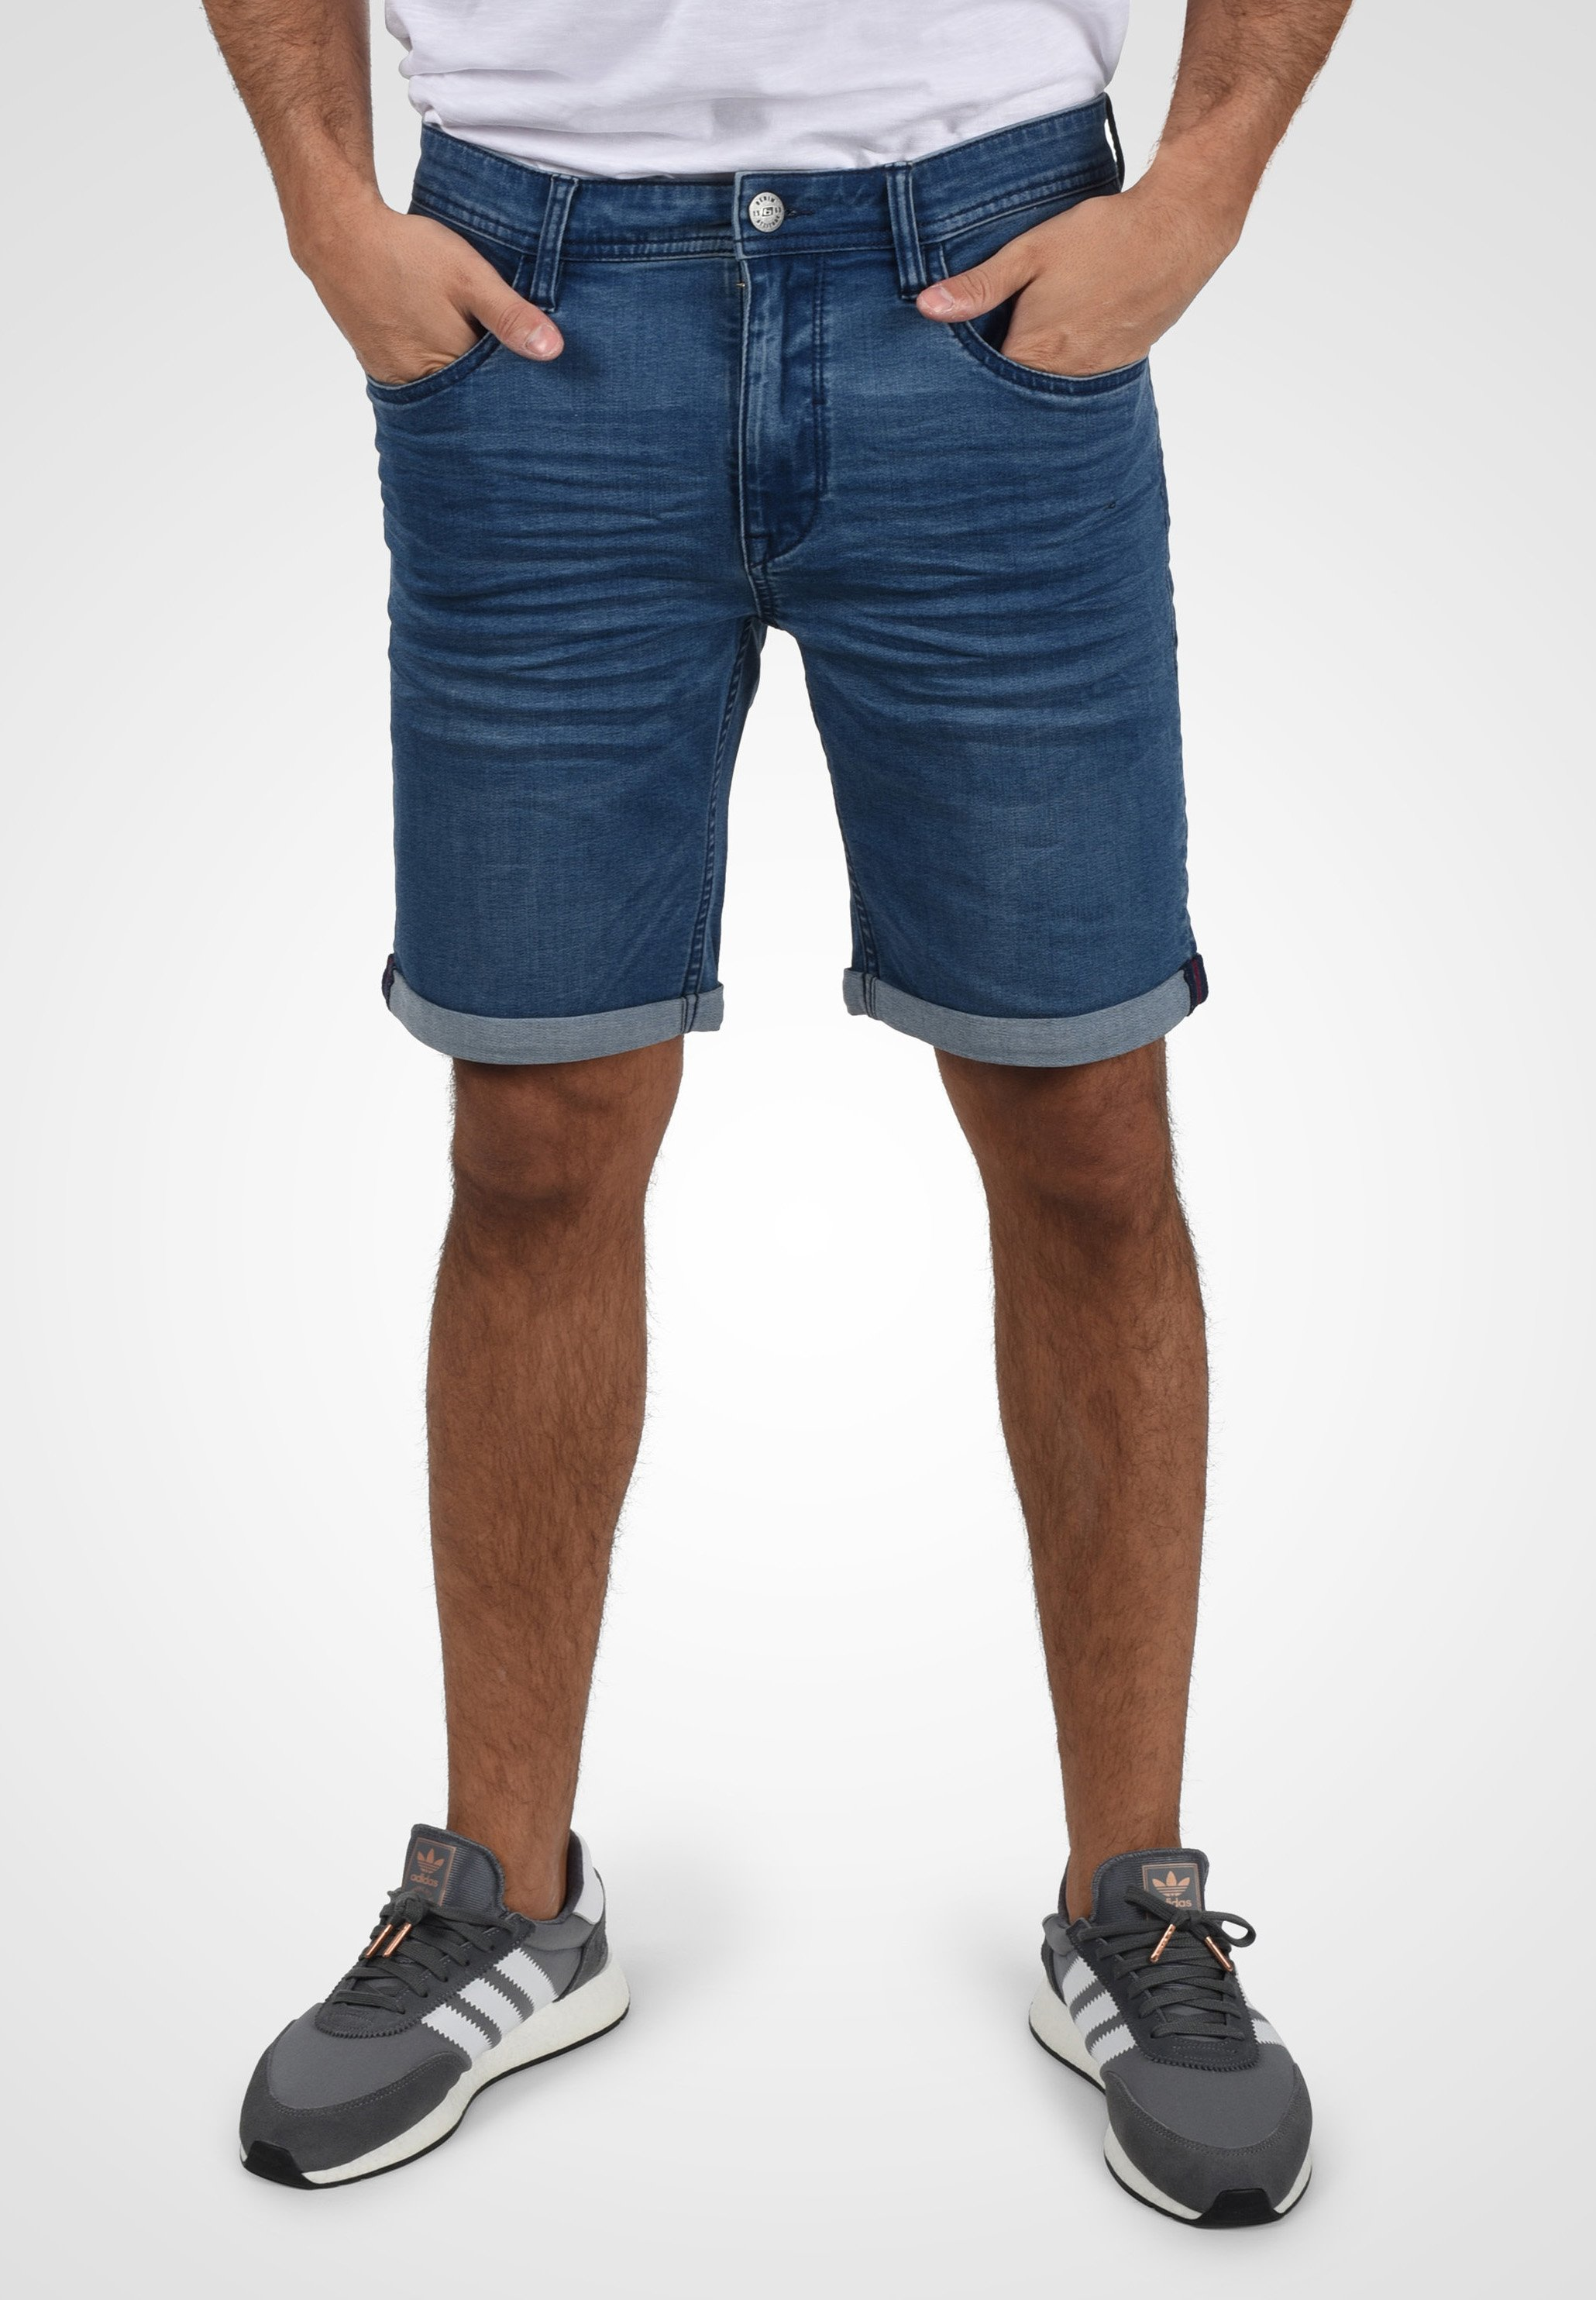 Herrer BENDIGO - Jeans Short / cowboy shorts